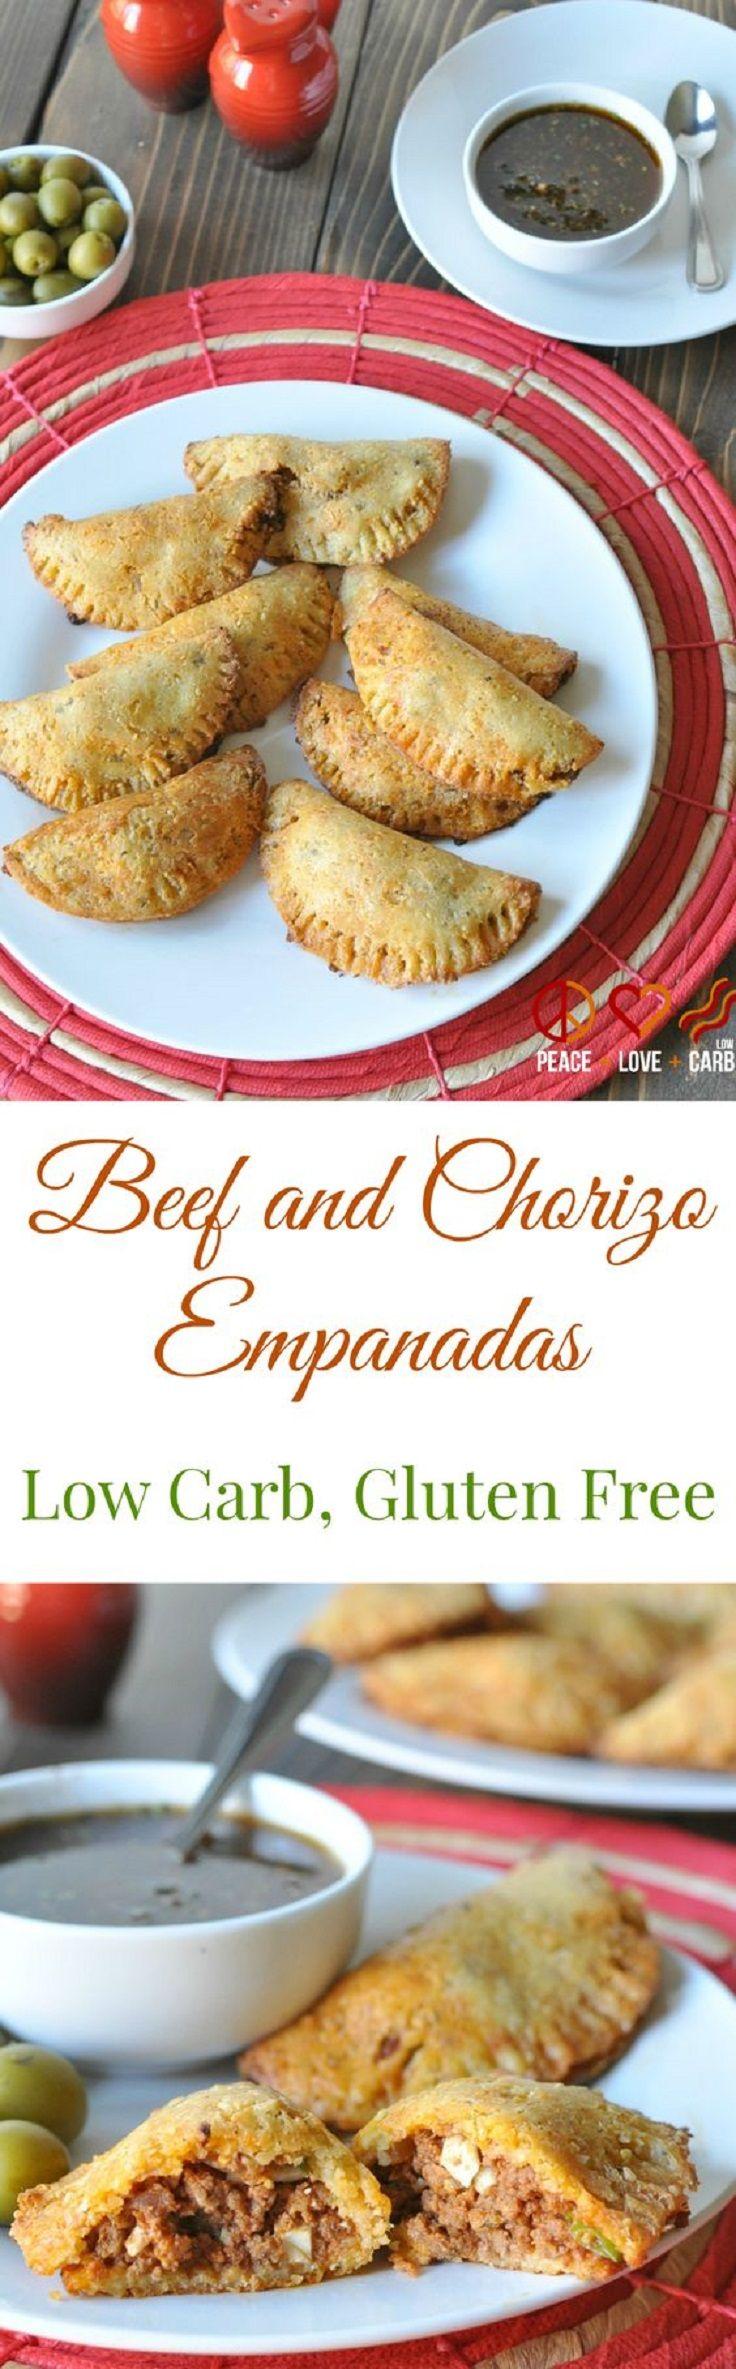 Beef and Chorizo Empanadas - 14 Unbelievably Delicious Empanadas Which You Mustn't Miss